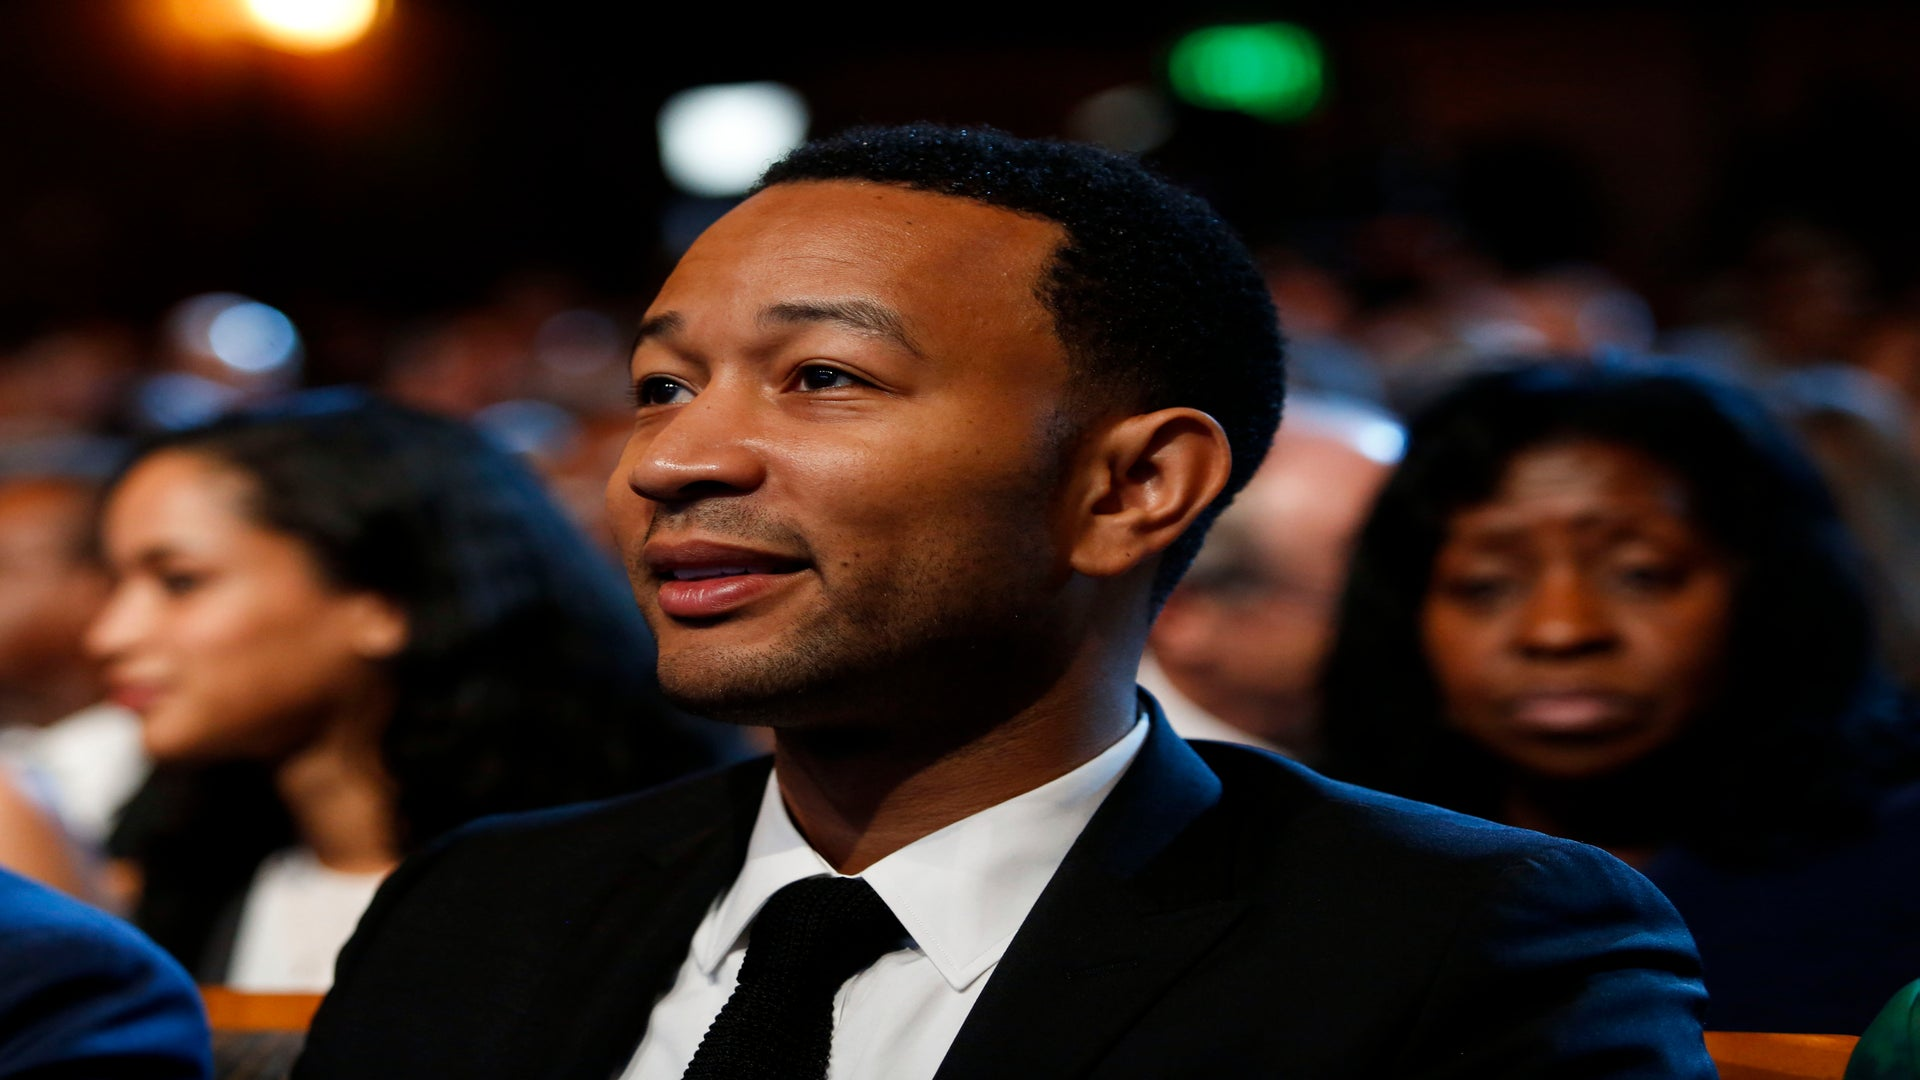 John Legend To Play Frederick Douglass On WGN America's 'Underground'